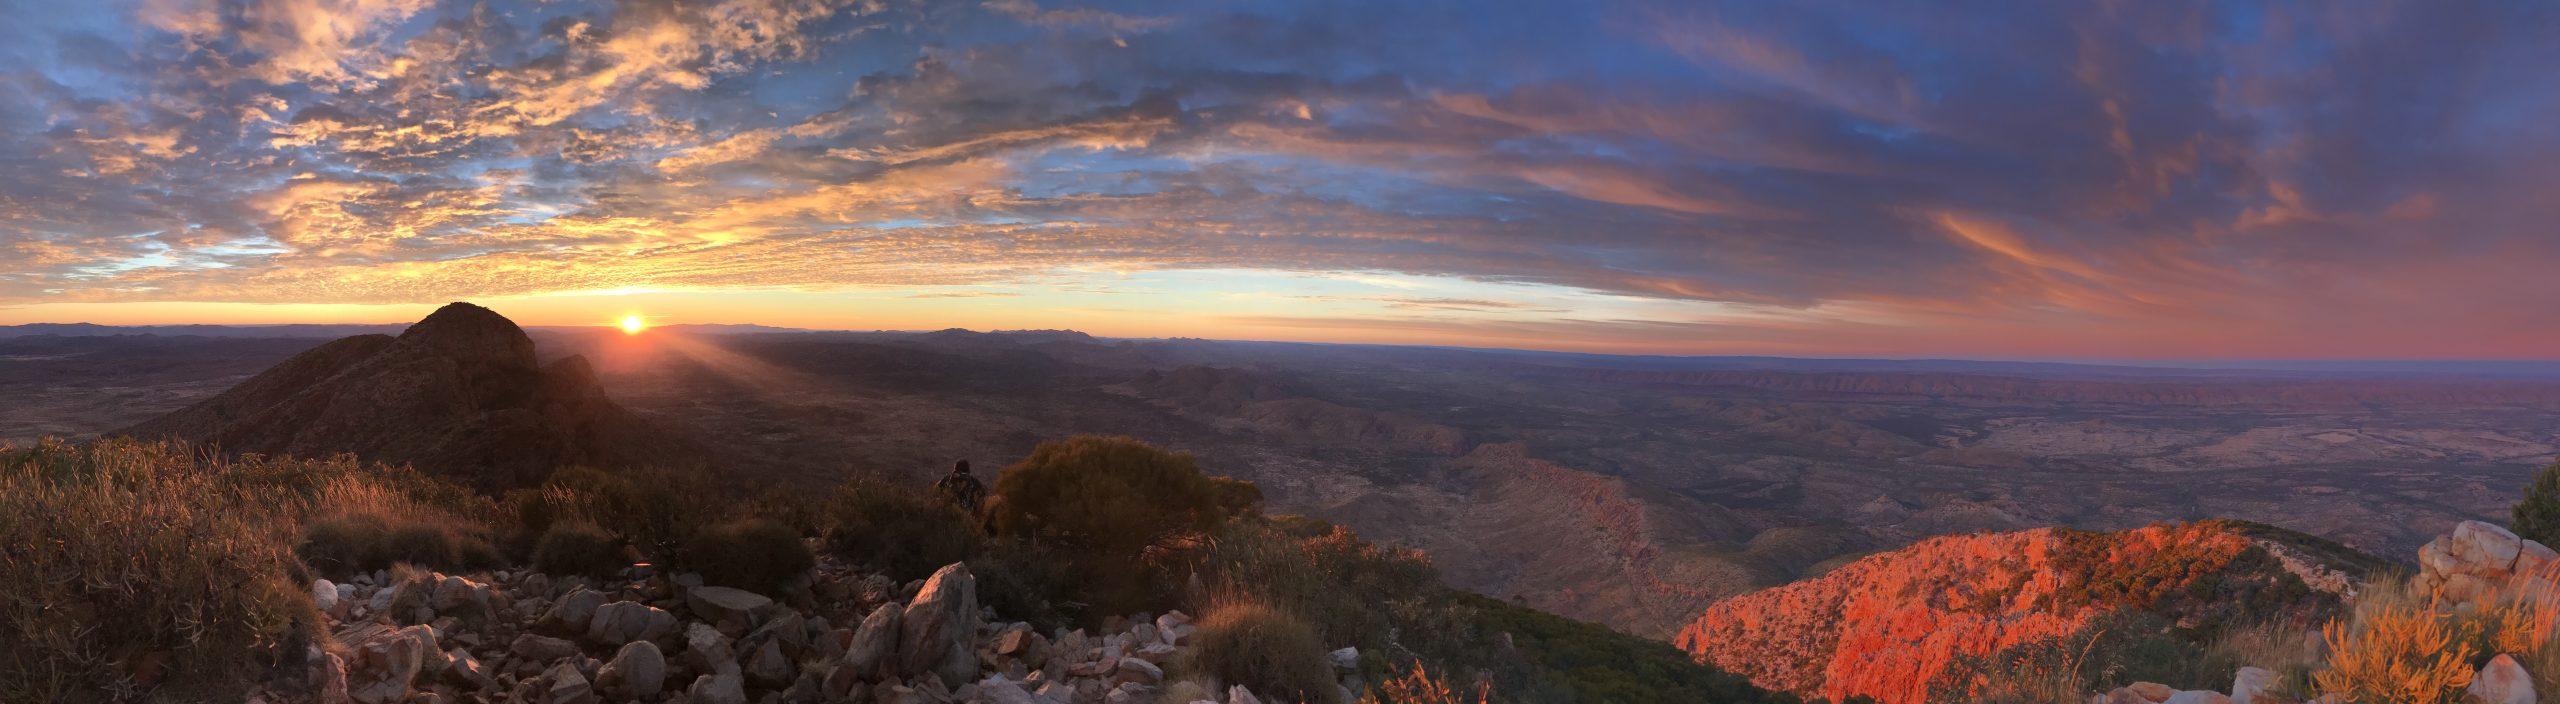 Trekking the Larapinta Trail, Australia